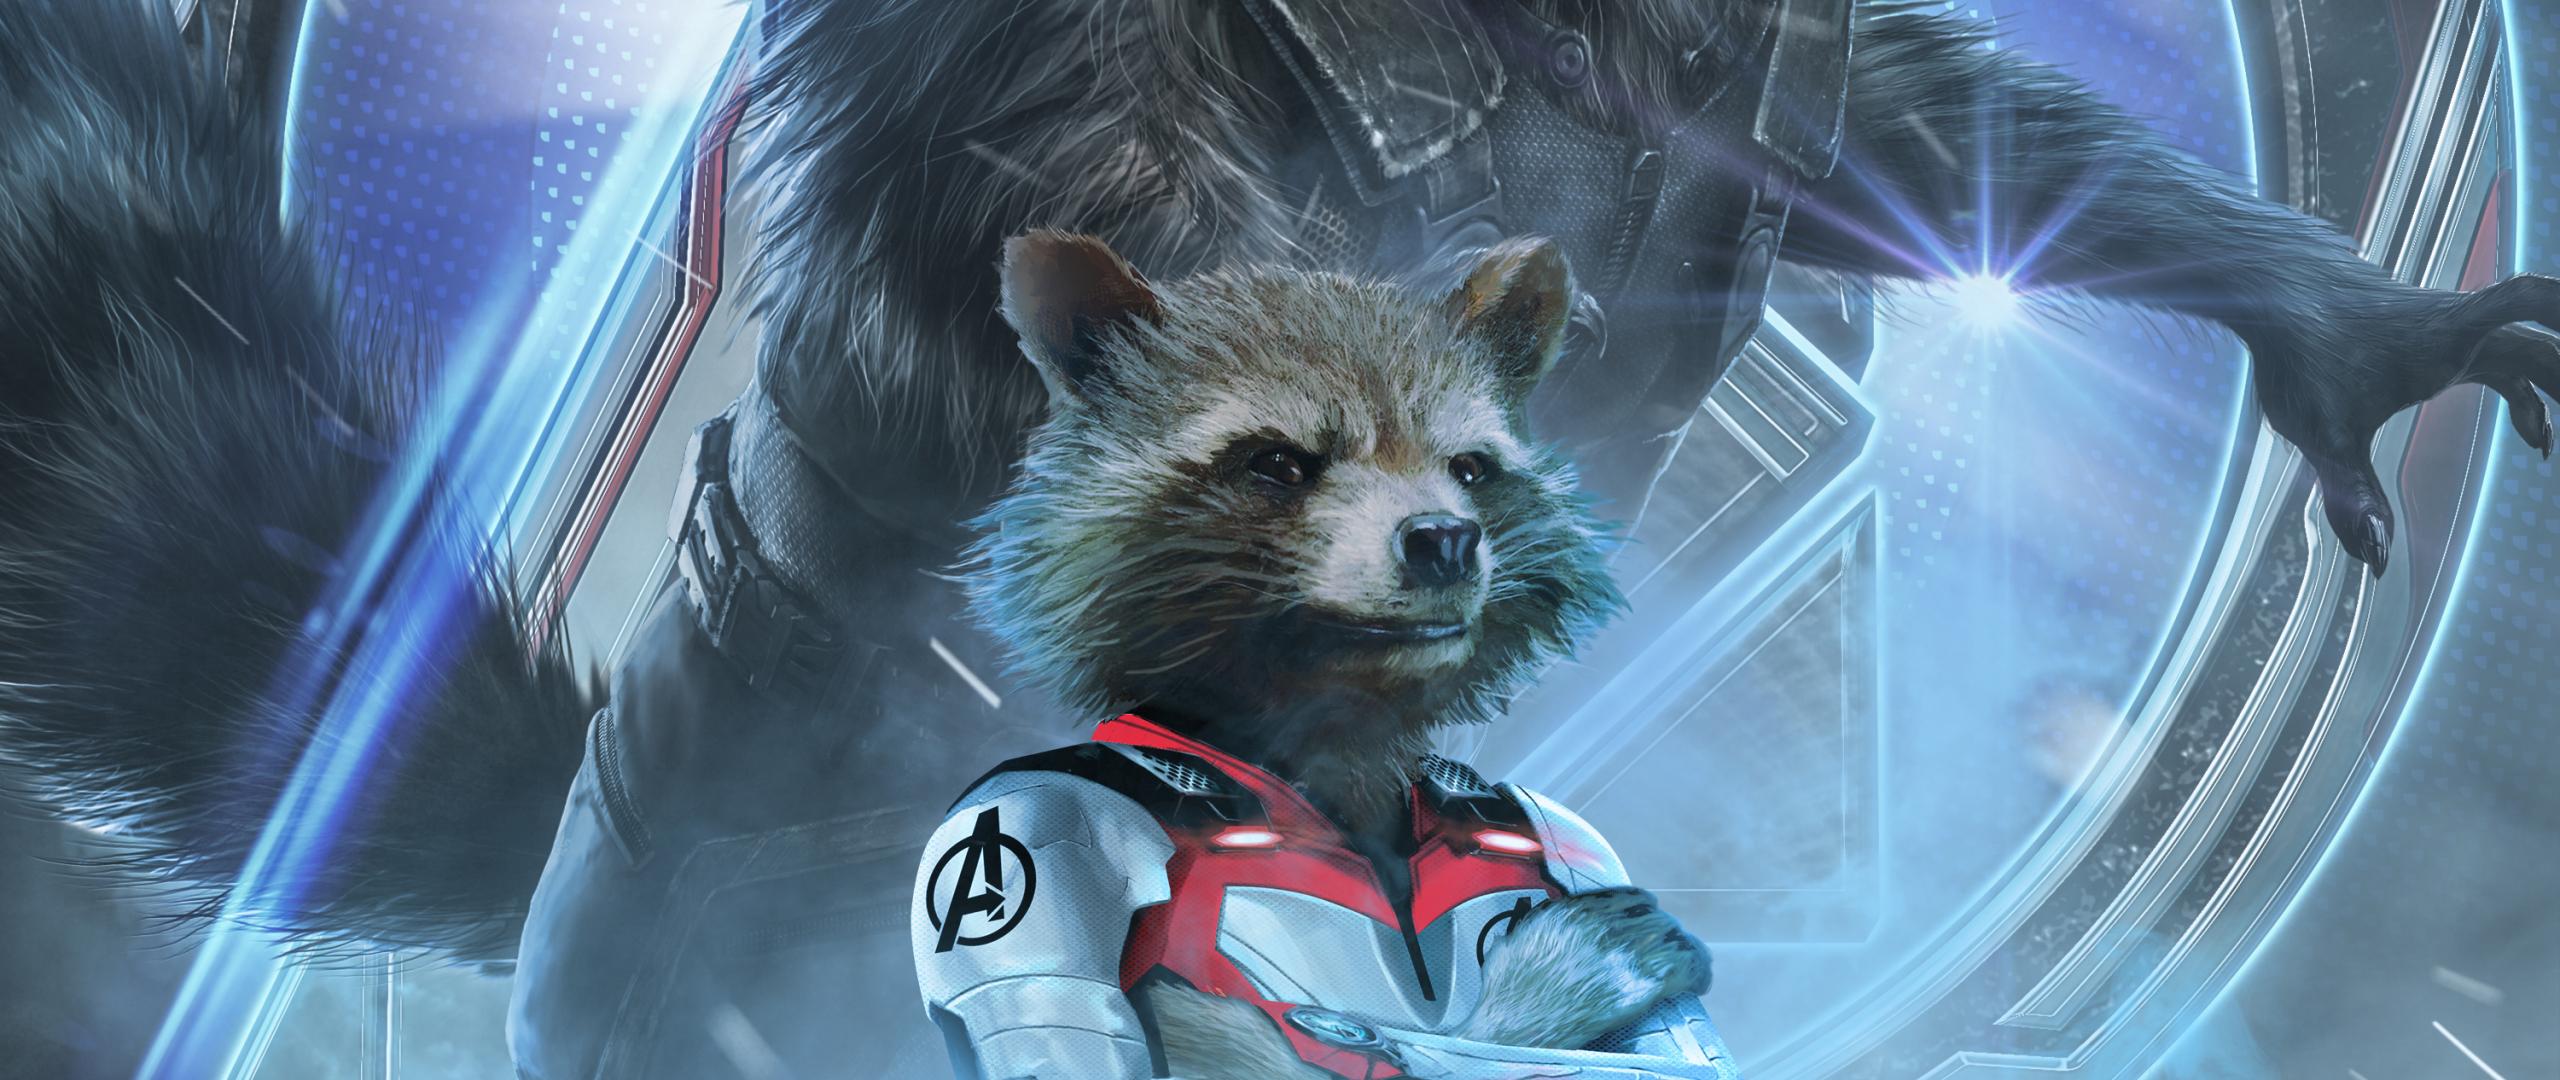 2560x1080 avengers endgame rocket raccoon poster art - Rocket raccoon phone wallpaper ...